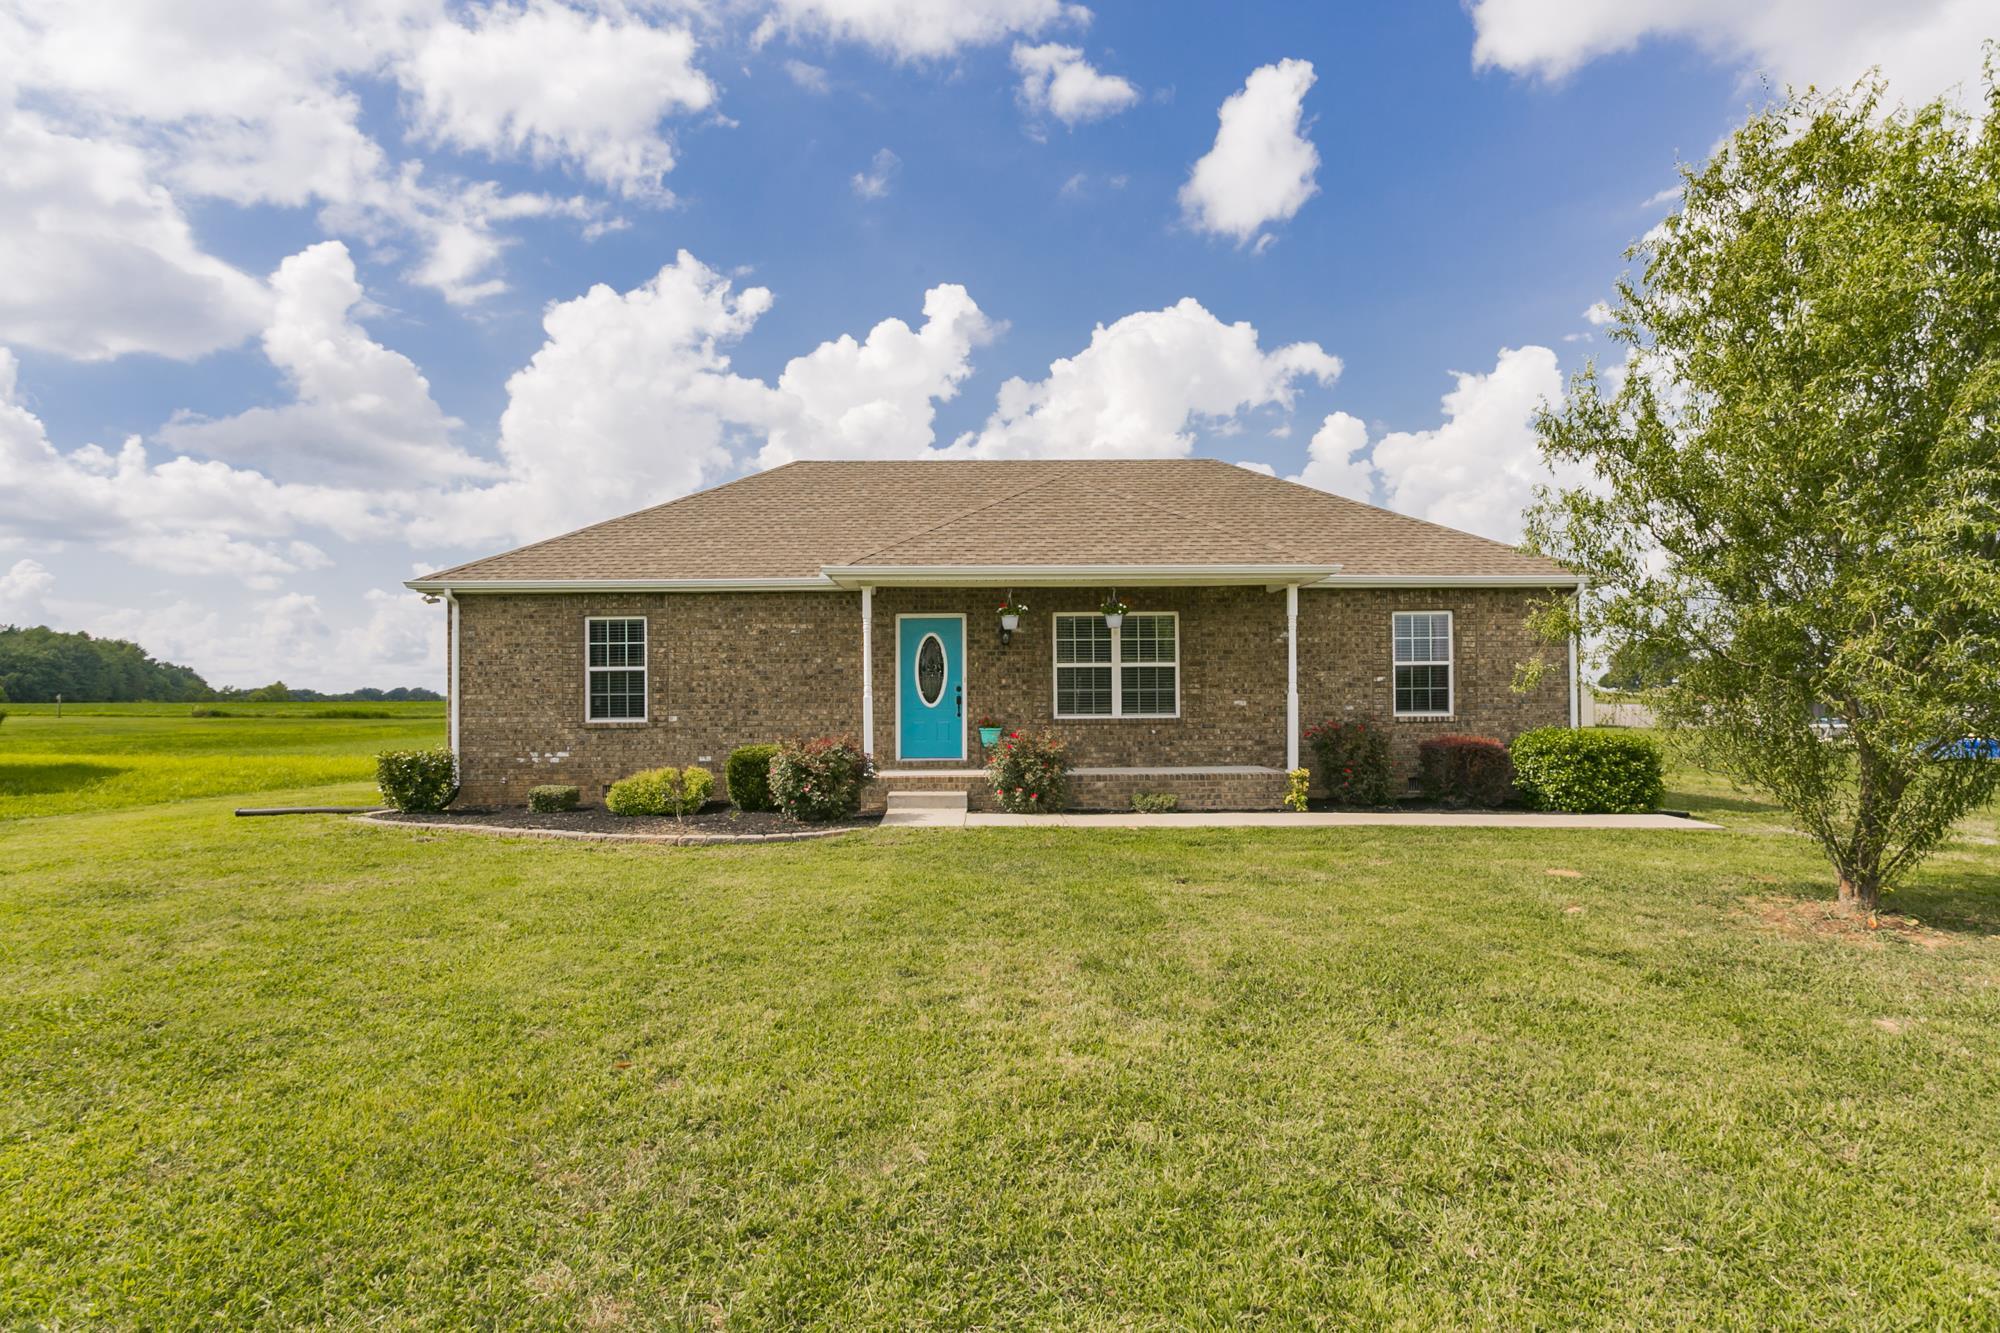 7980 Highway 52, Orlinda, TN 37141 - Orlinda, TN real estate listing